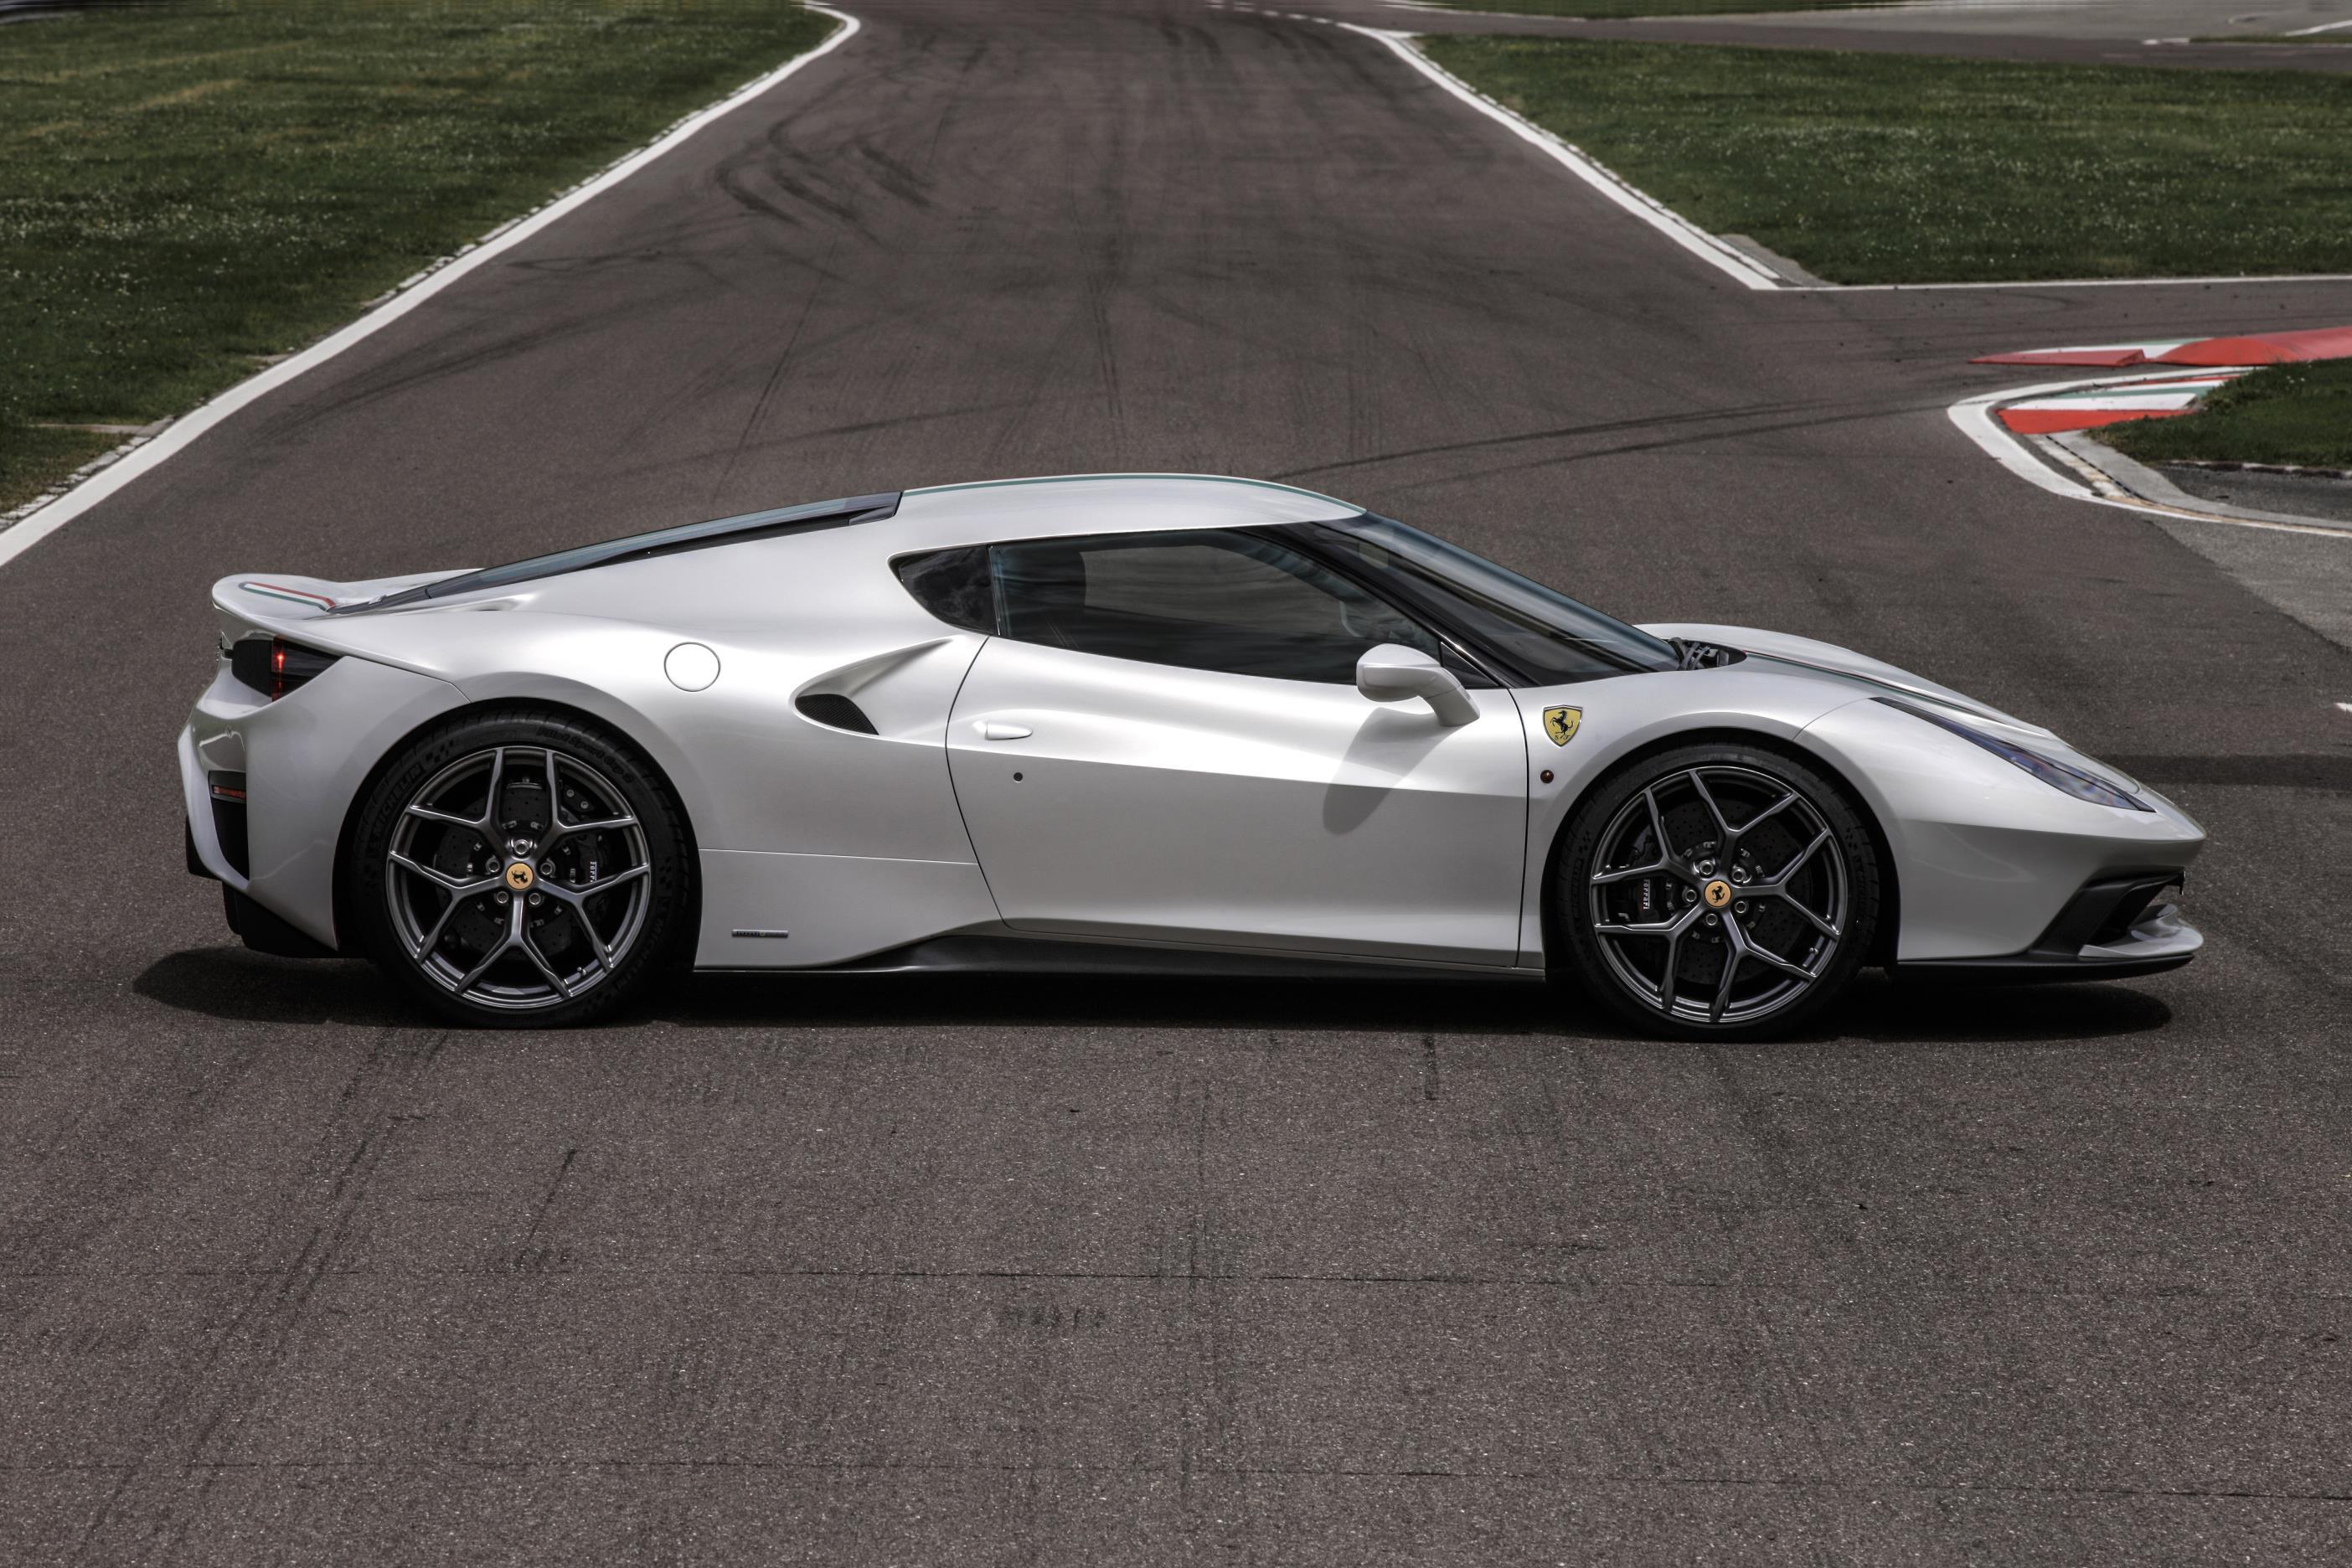 Ferrari 458 MM Speciale, Ferrari 458 Speciale